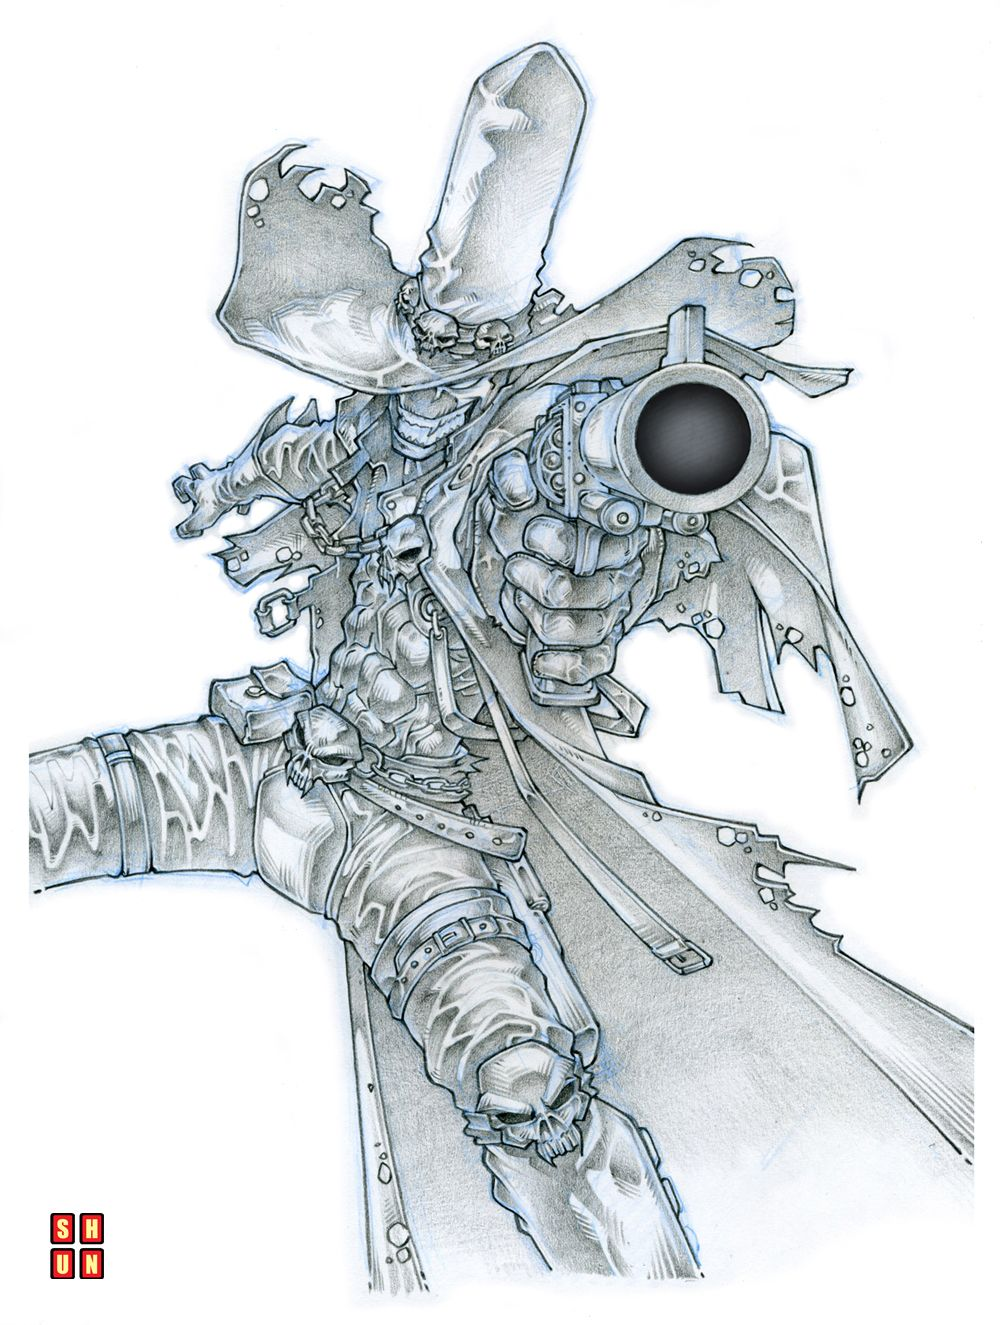 Gunslinger Spawn 001 by Shun-008.deviantart.com | Illustration ...